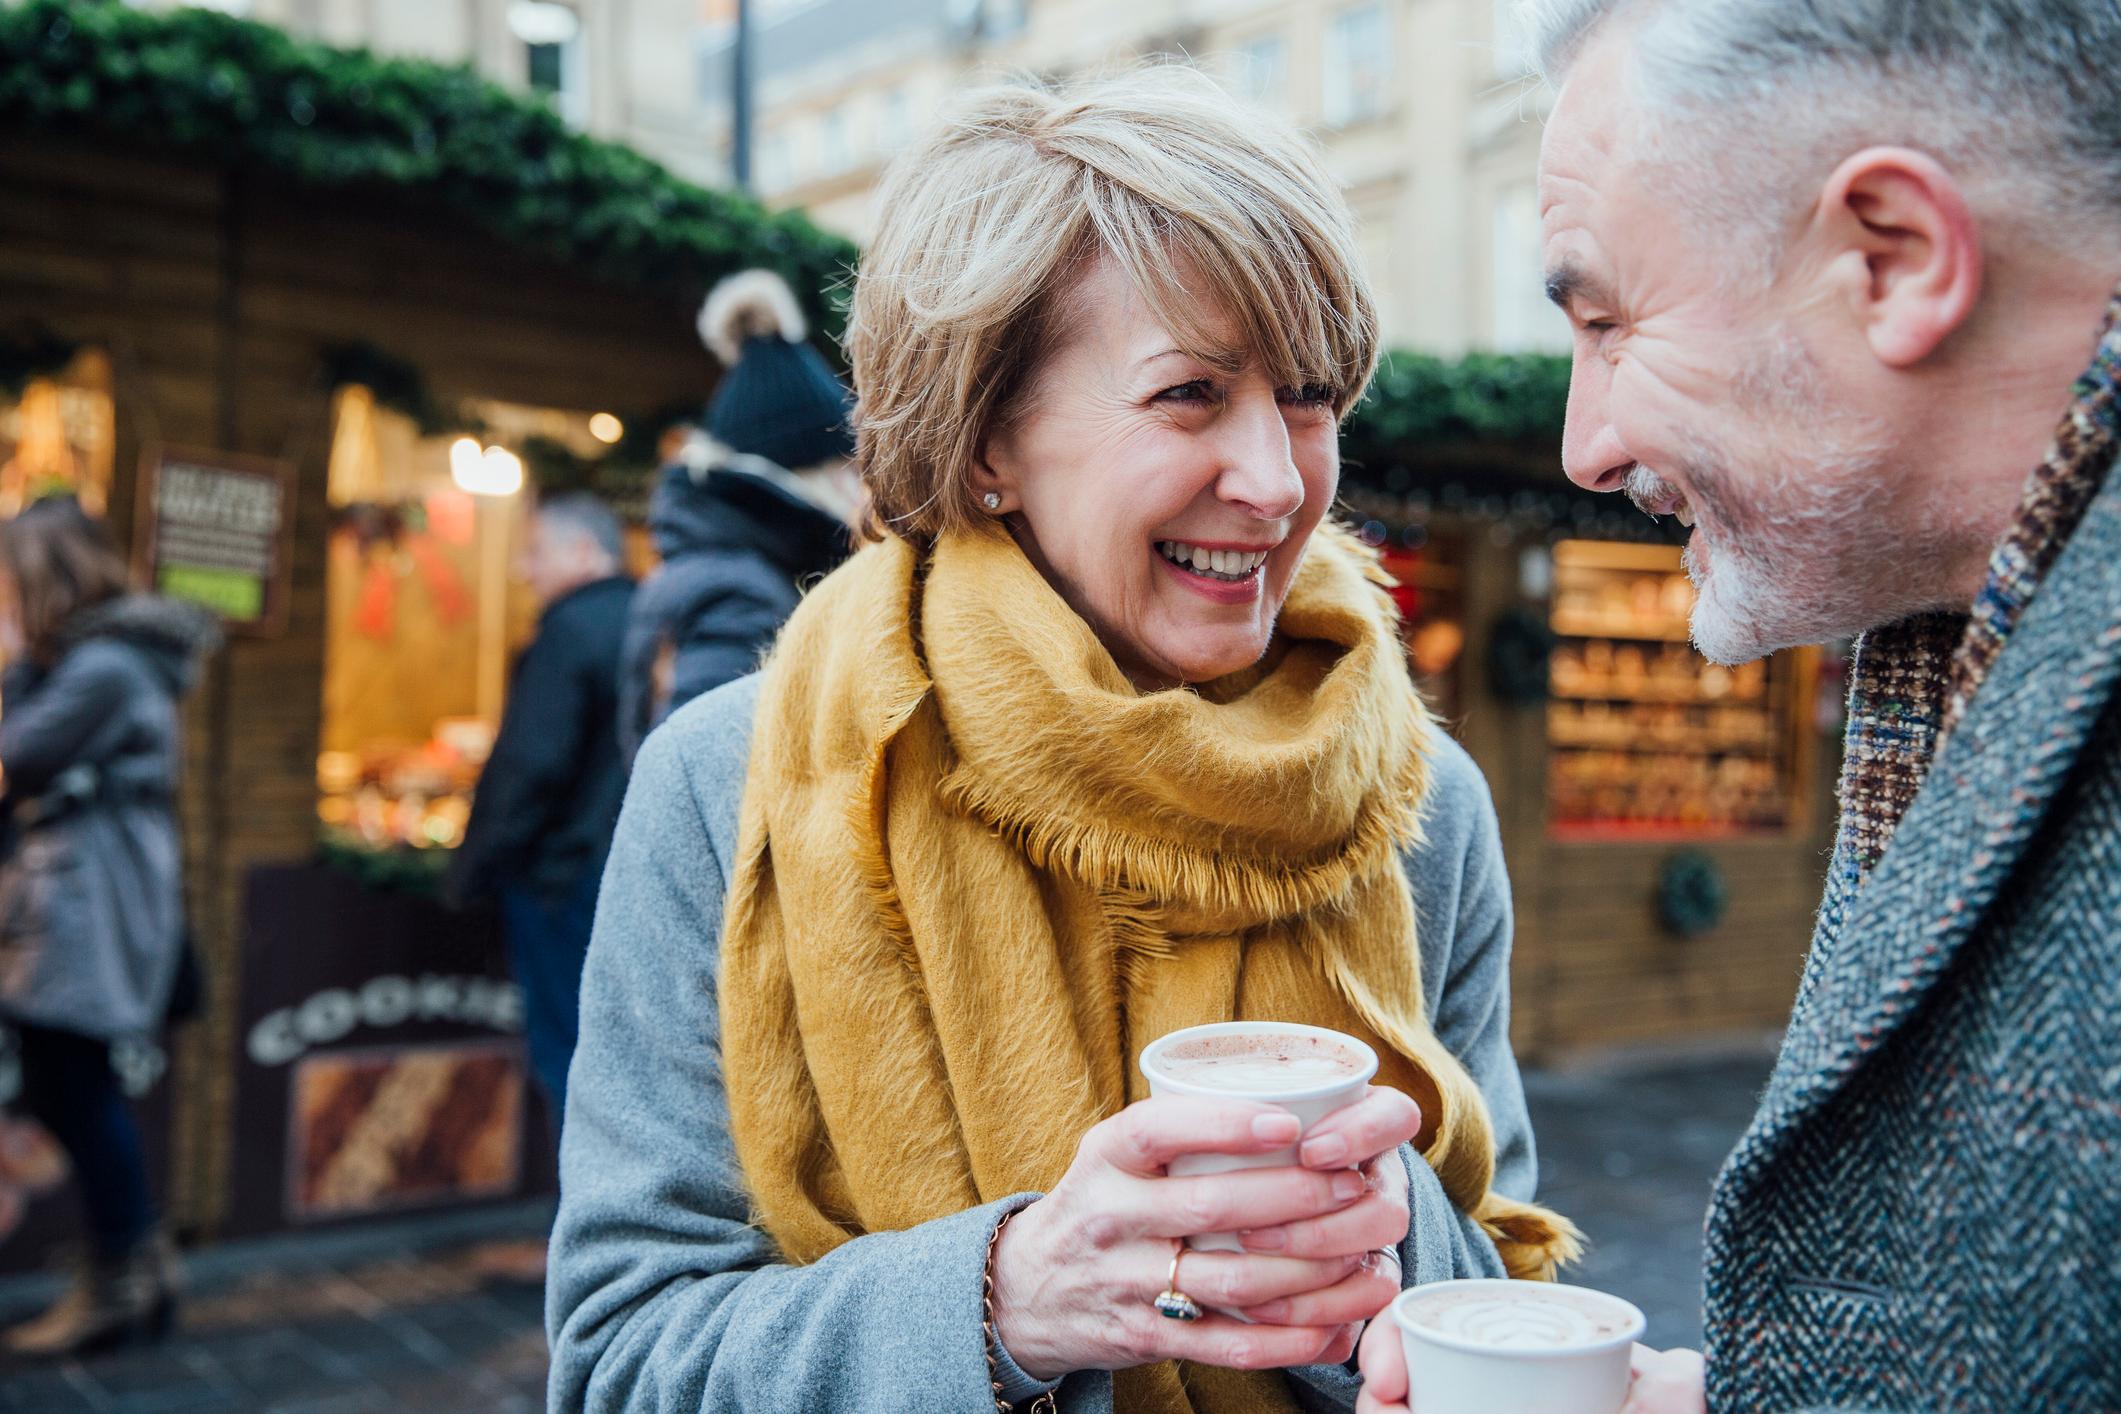 50 over dating dating online usa gratis